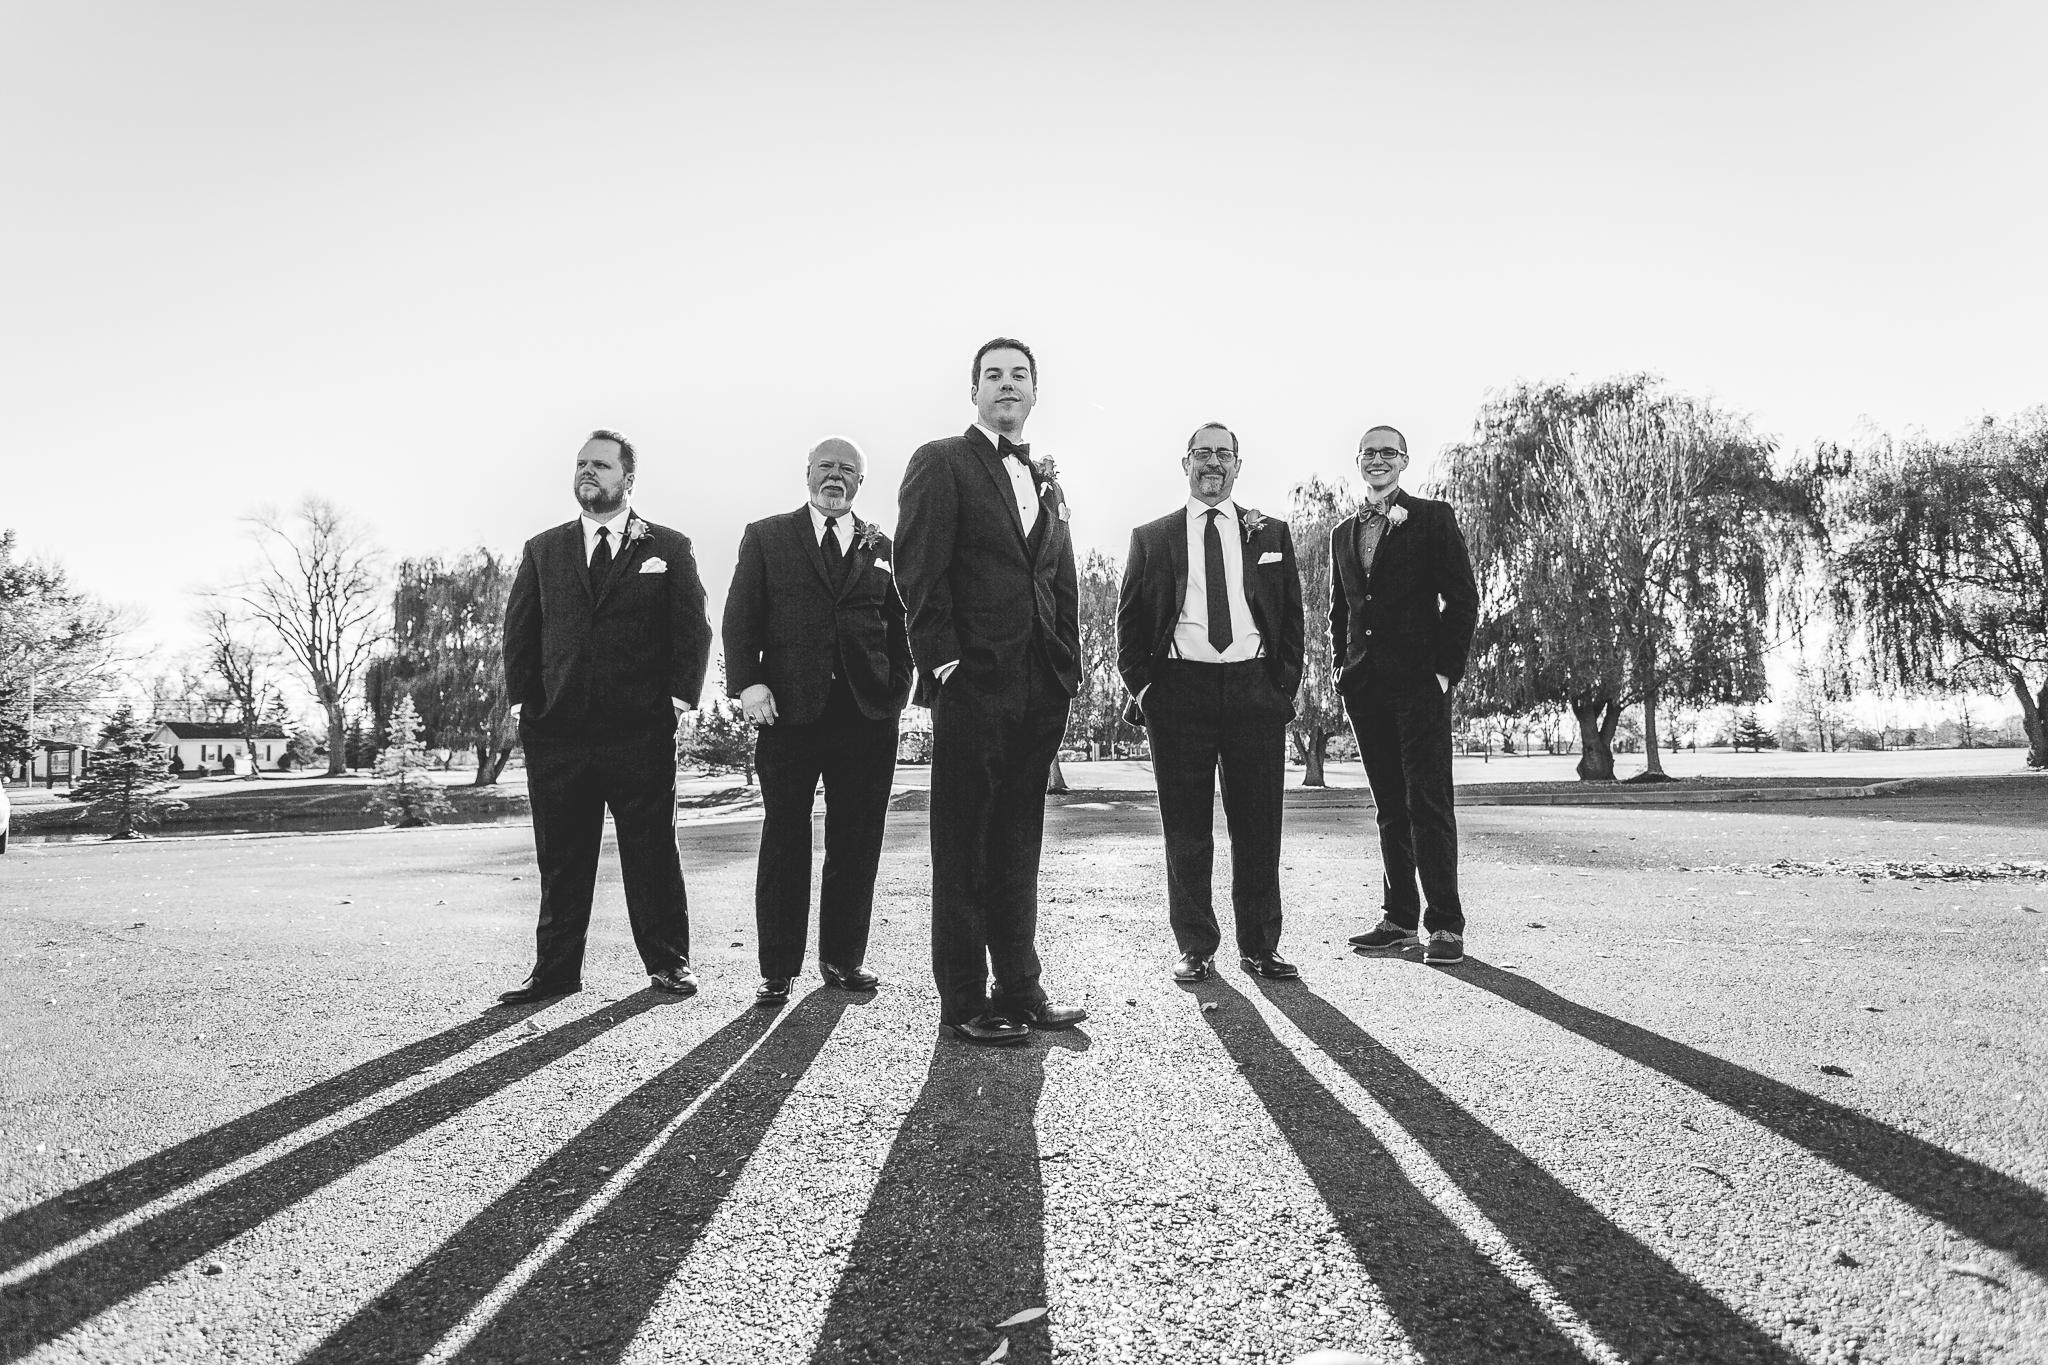 camuglia-whomstudio-chelsea_and_andy-nycphotographer-wedding-brooklyn-buffalo-timberlodge-035-5366.jpg